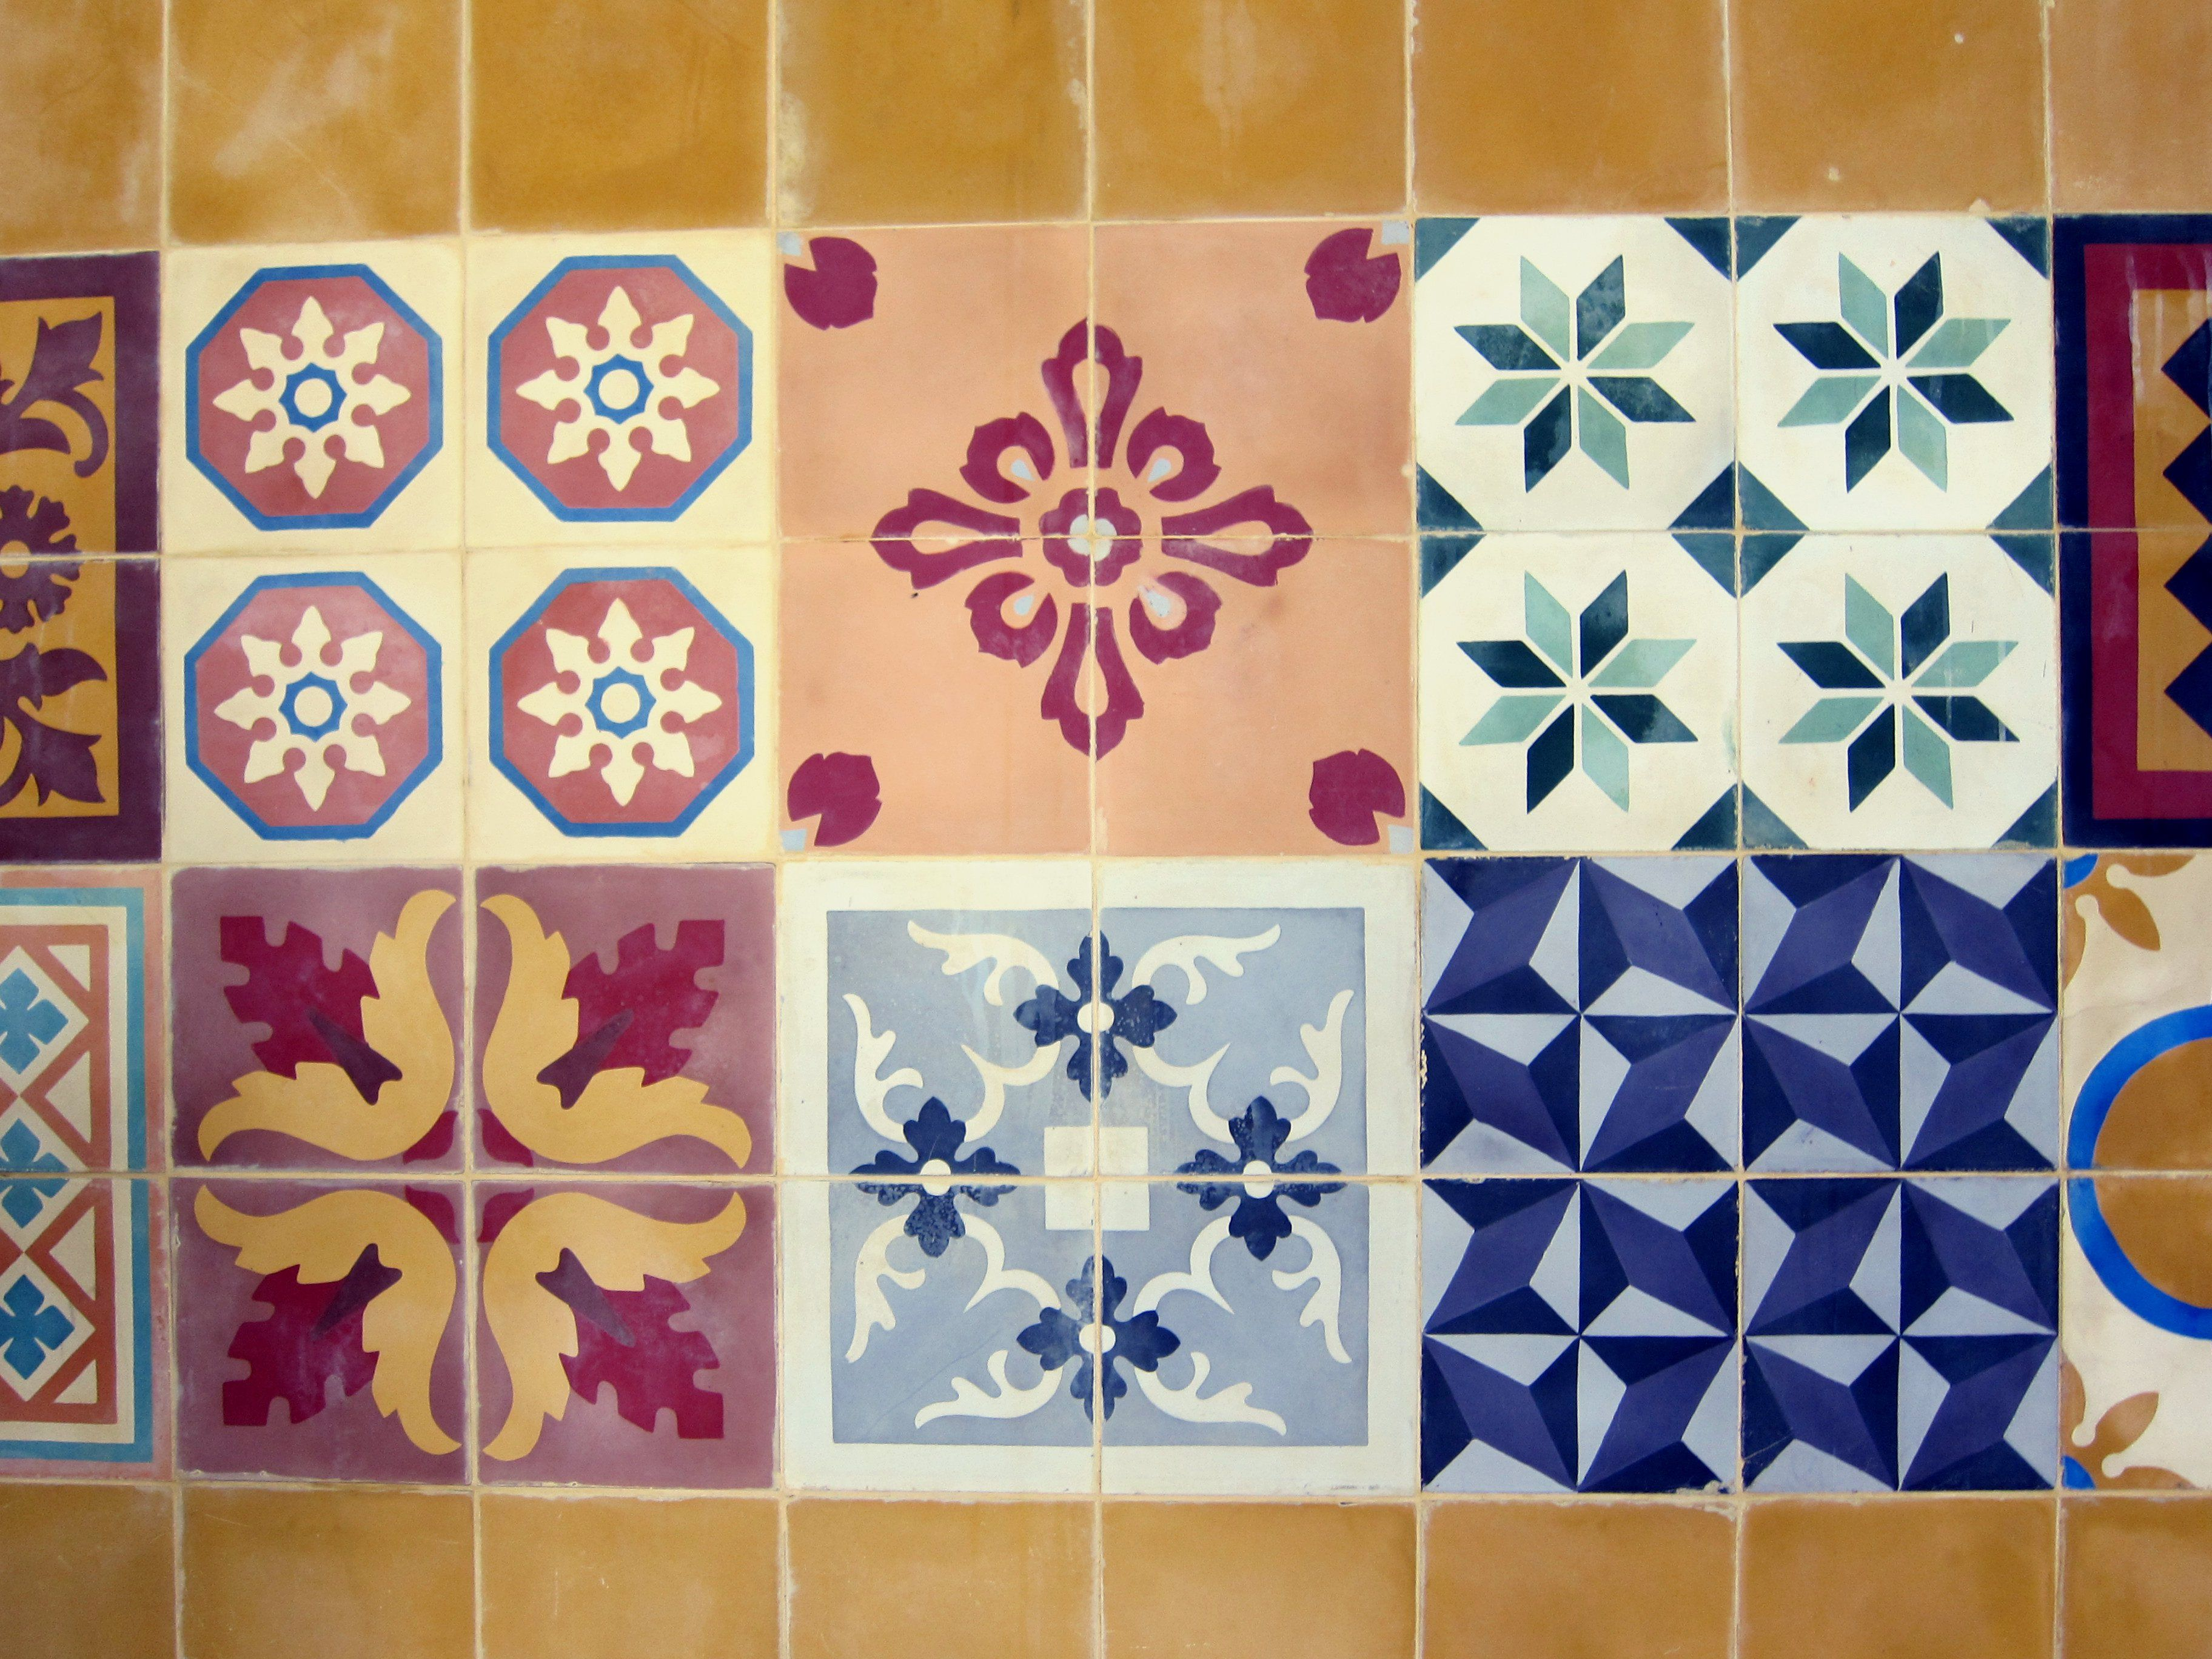 WARNA WARNI TEGEL KUNCI Cool Handmade Tiles From Yogyakarta Indonesia I Mean It